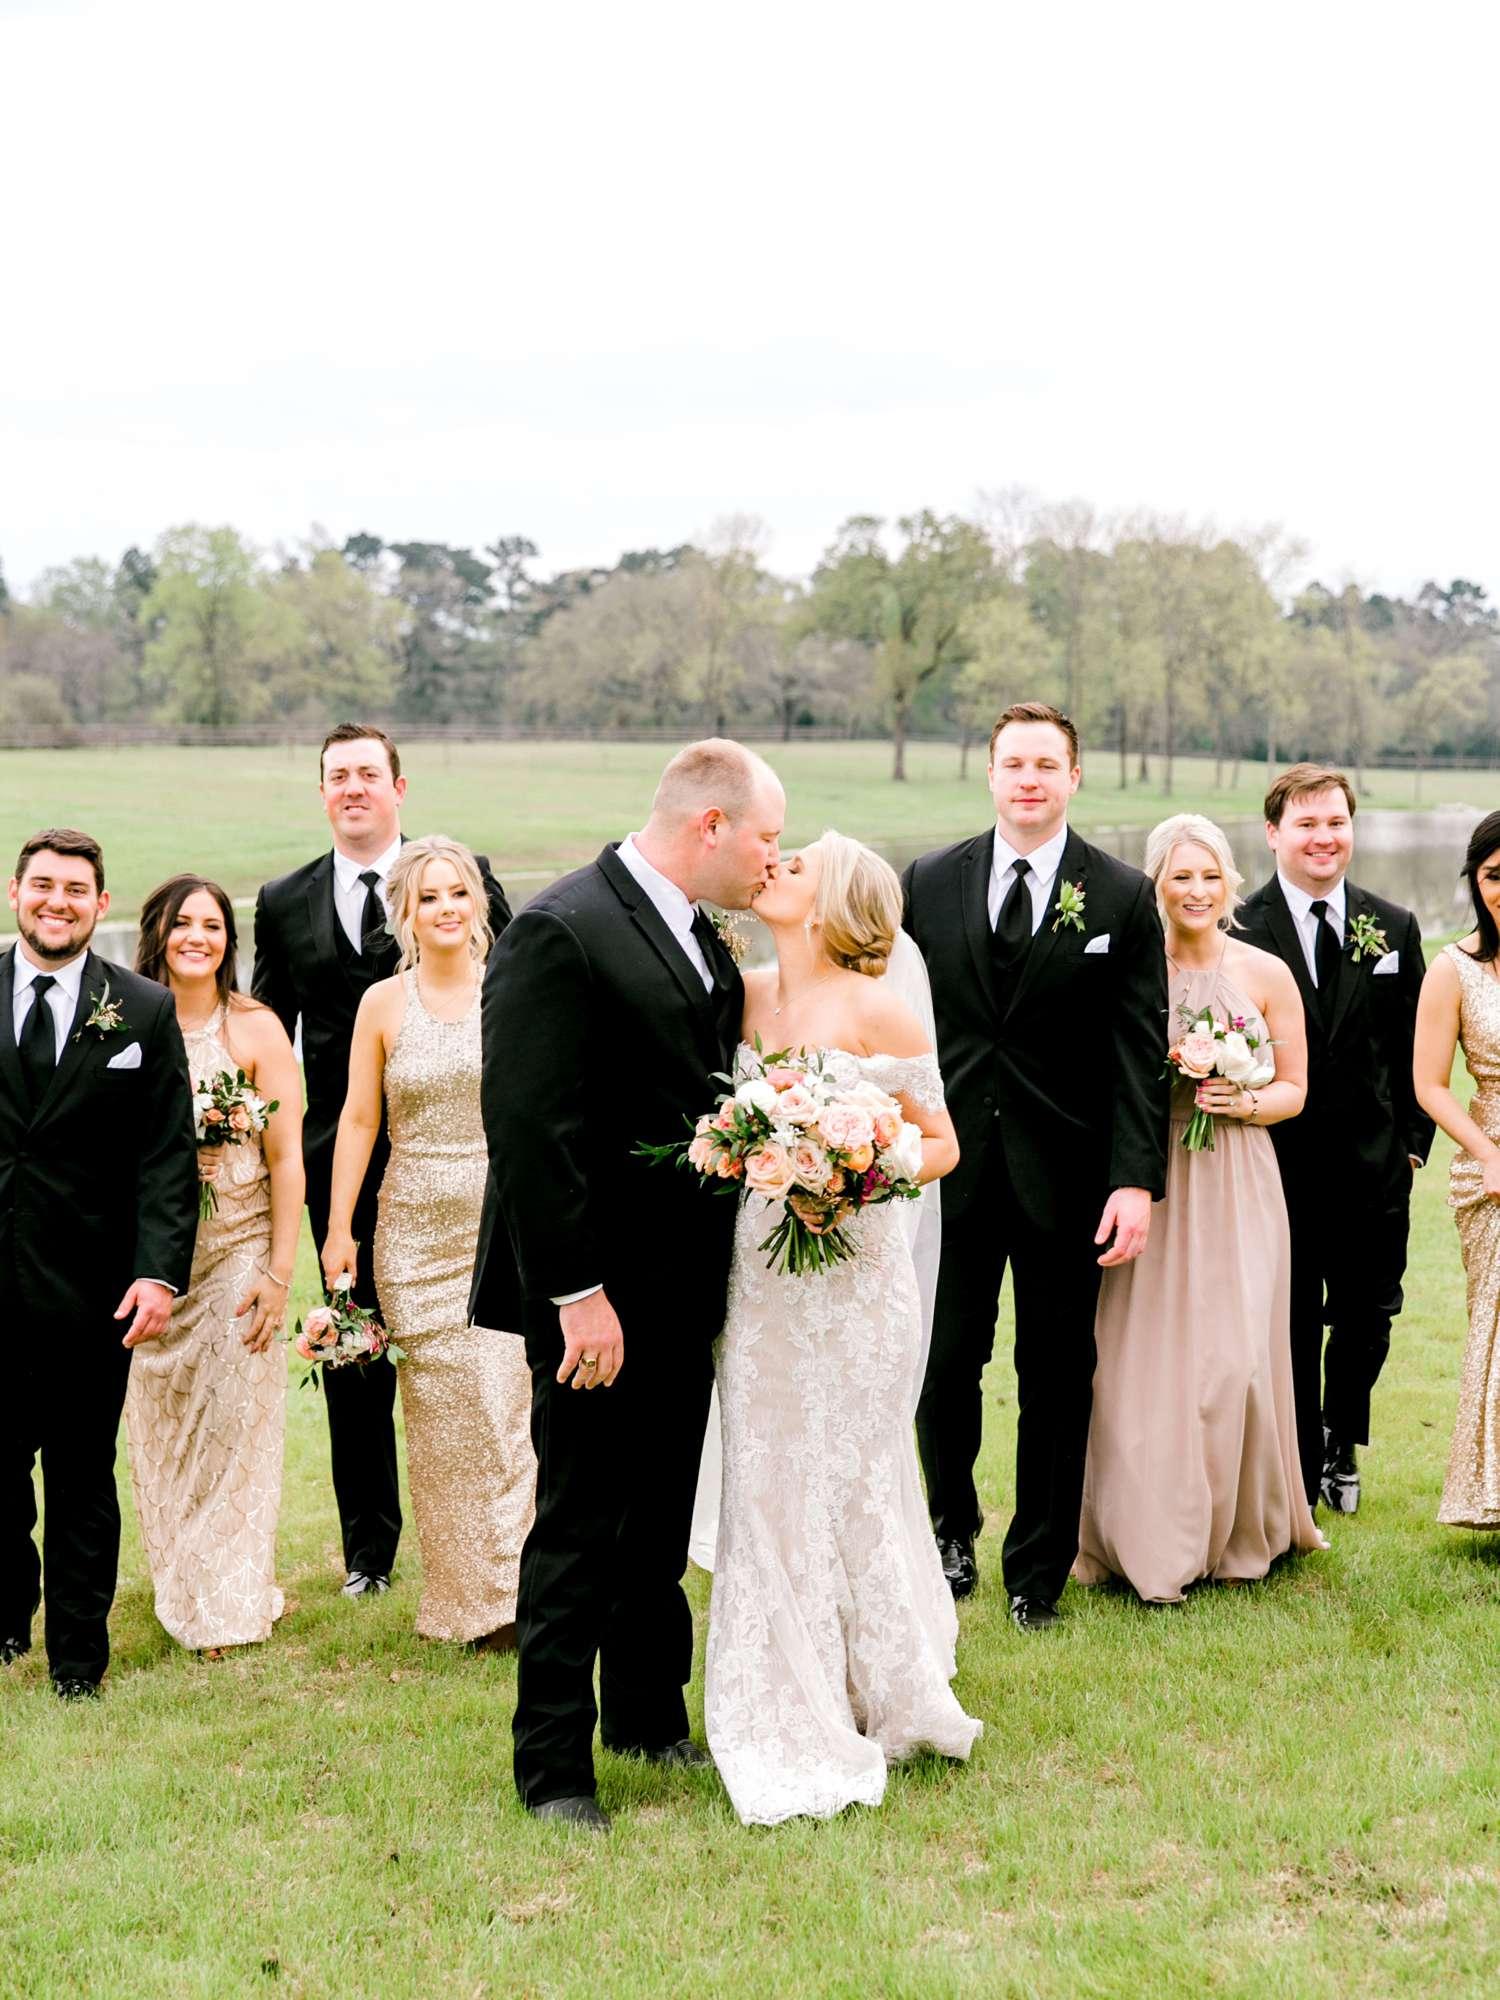 HEBERT_MORGAN_AND_CLAY_ALLEEJ_THE_FARMHOUSE_MONTGOMERY_TEXAS_WEDDING_0139.jpg